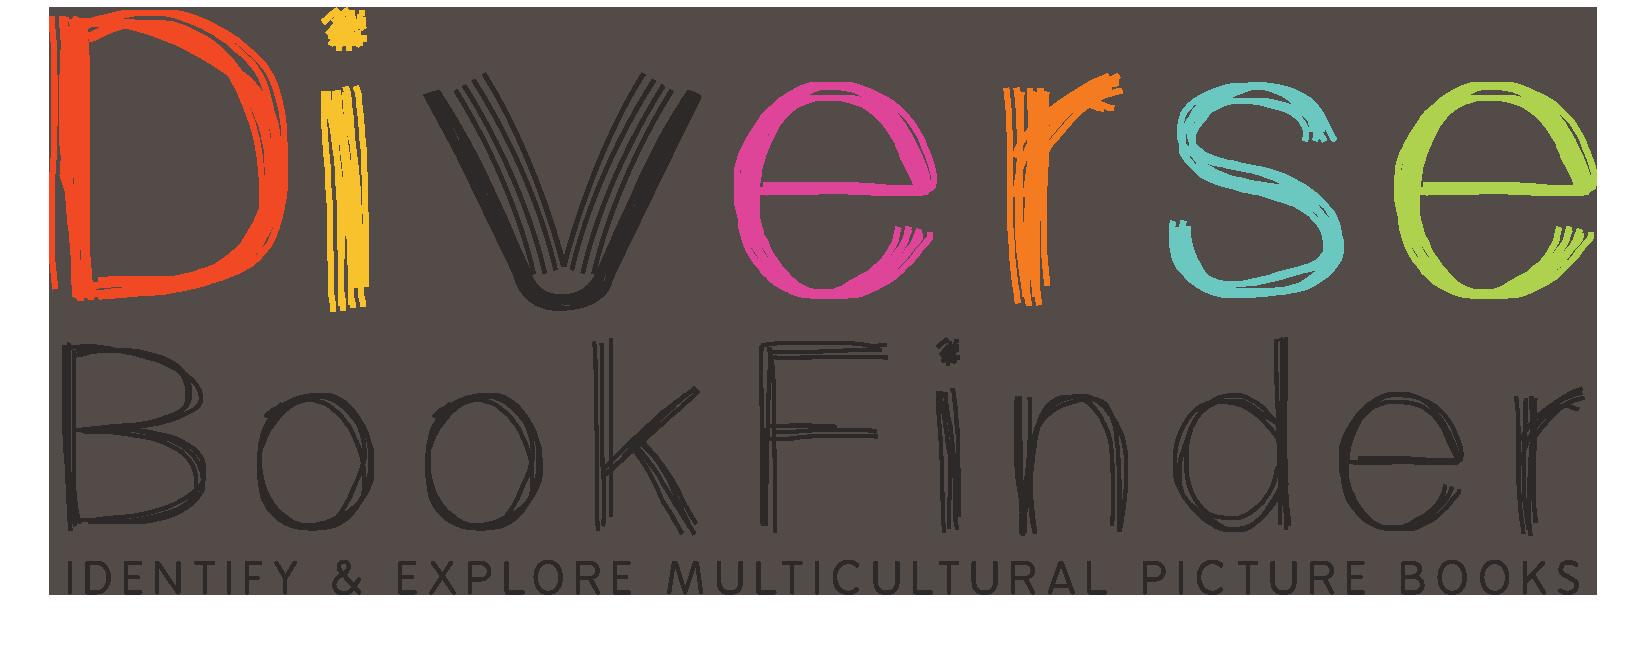 Diverse-Book-Finder-LOGO_no-people.png